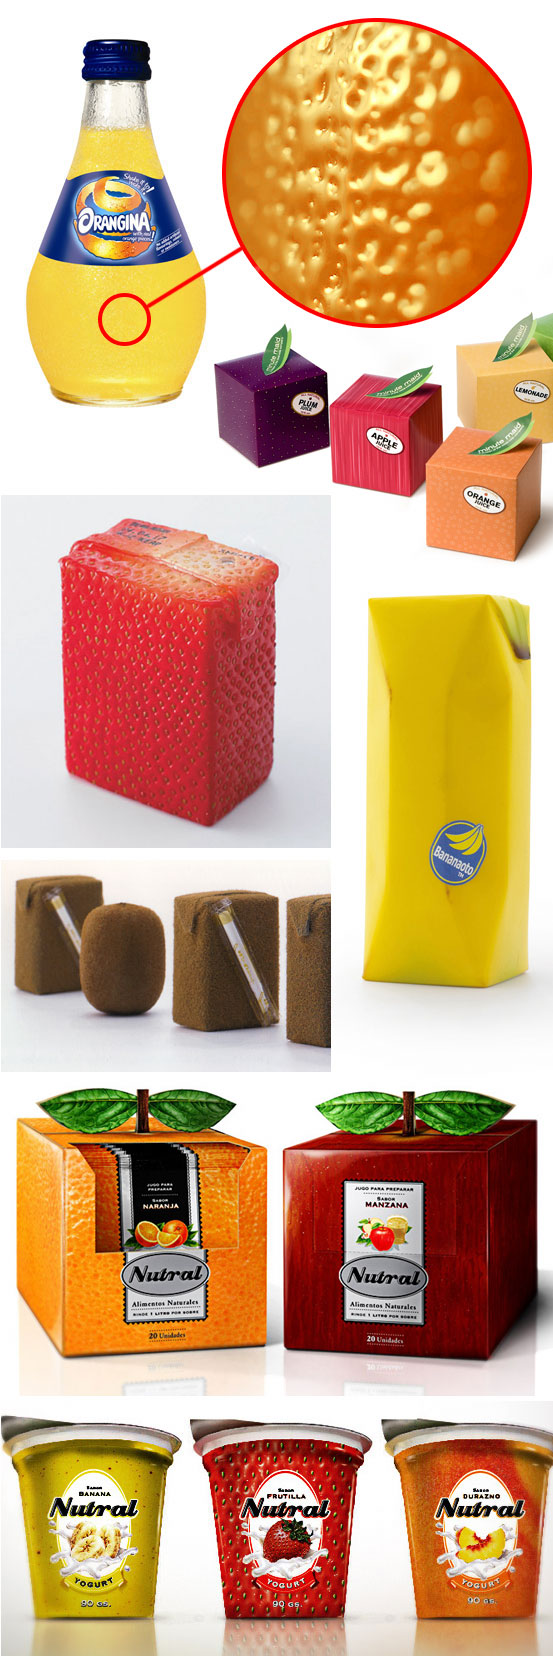 Skin-Packs